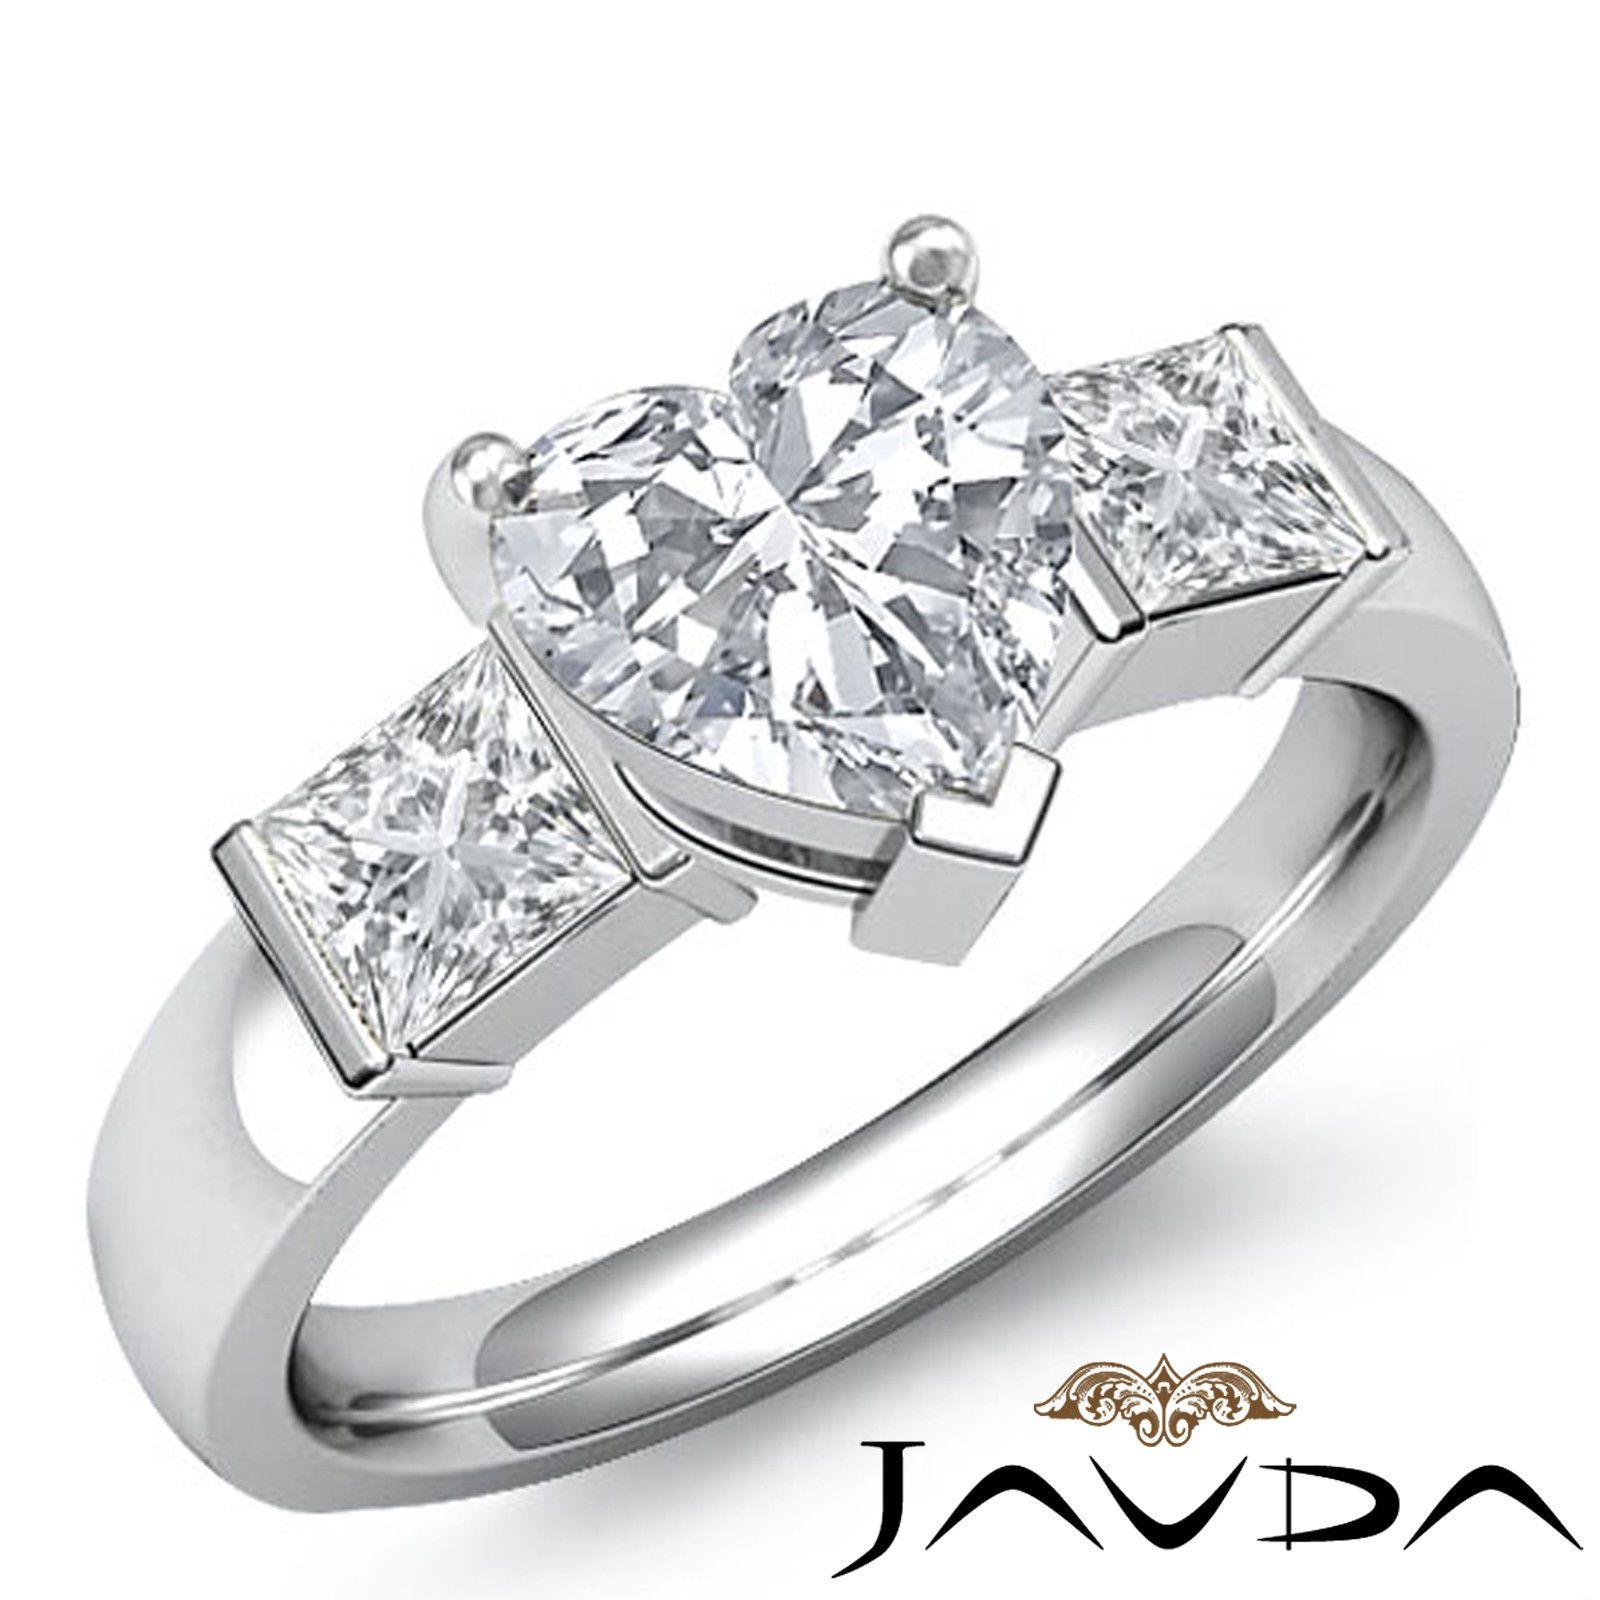 ebay wedding rings sets Three Stone Heart Diamond Bar Set Ideal Engagement Ring EGL G VS2 Platinum 1 6ct